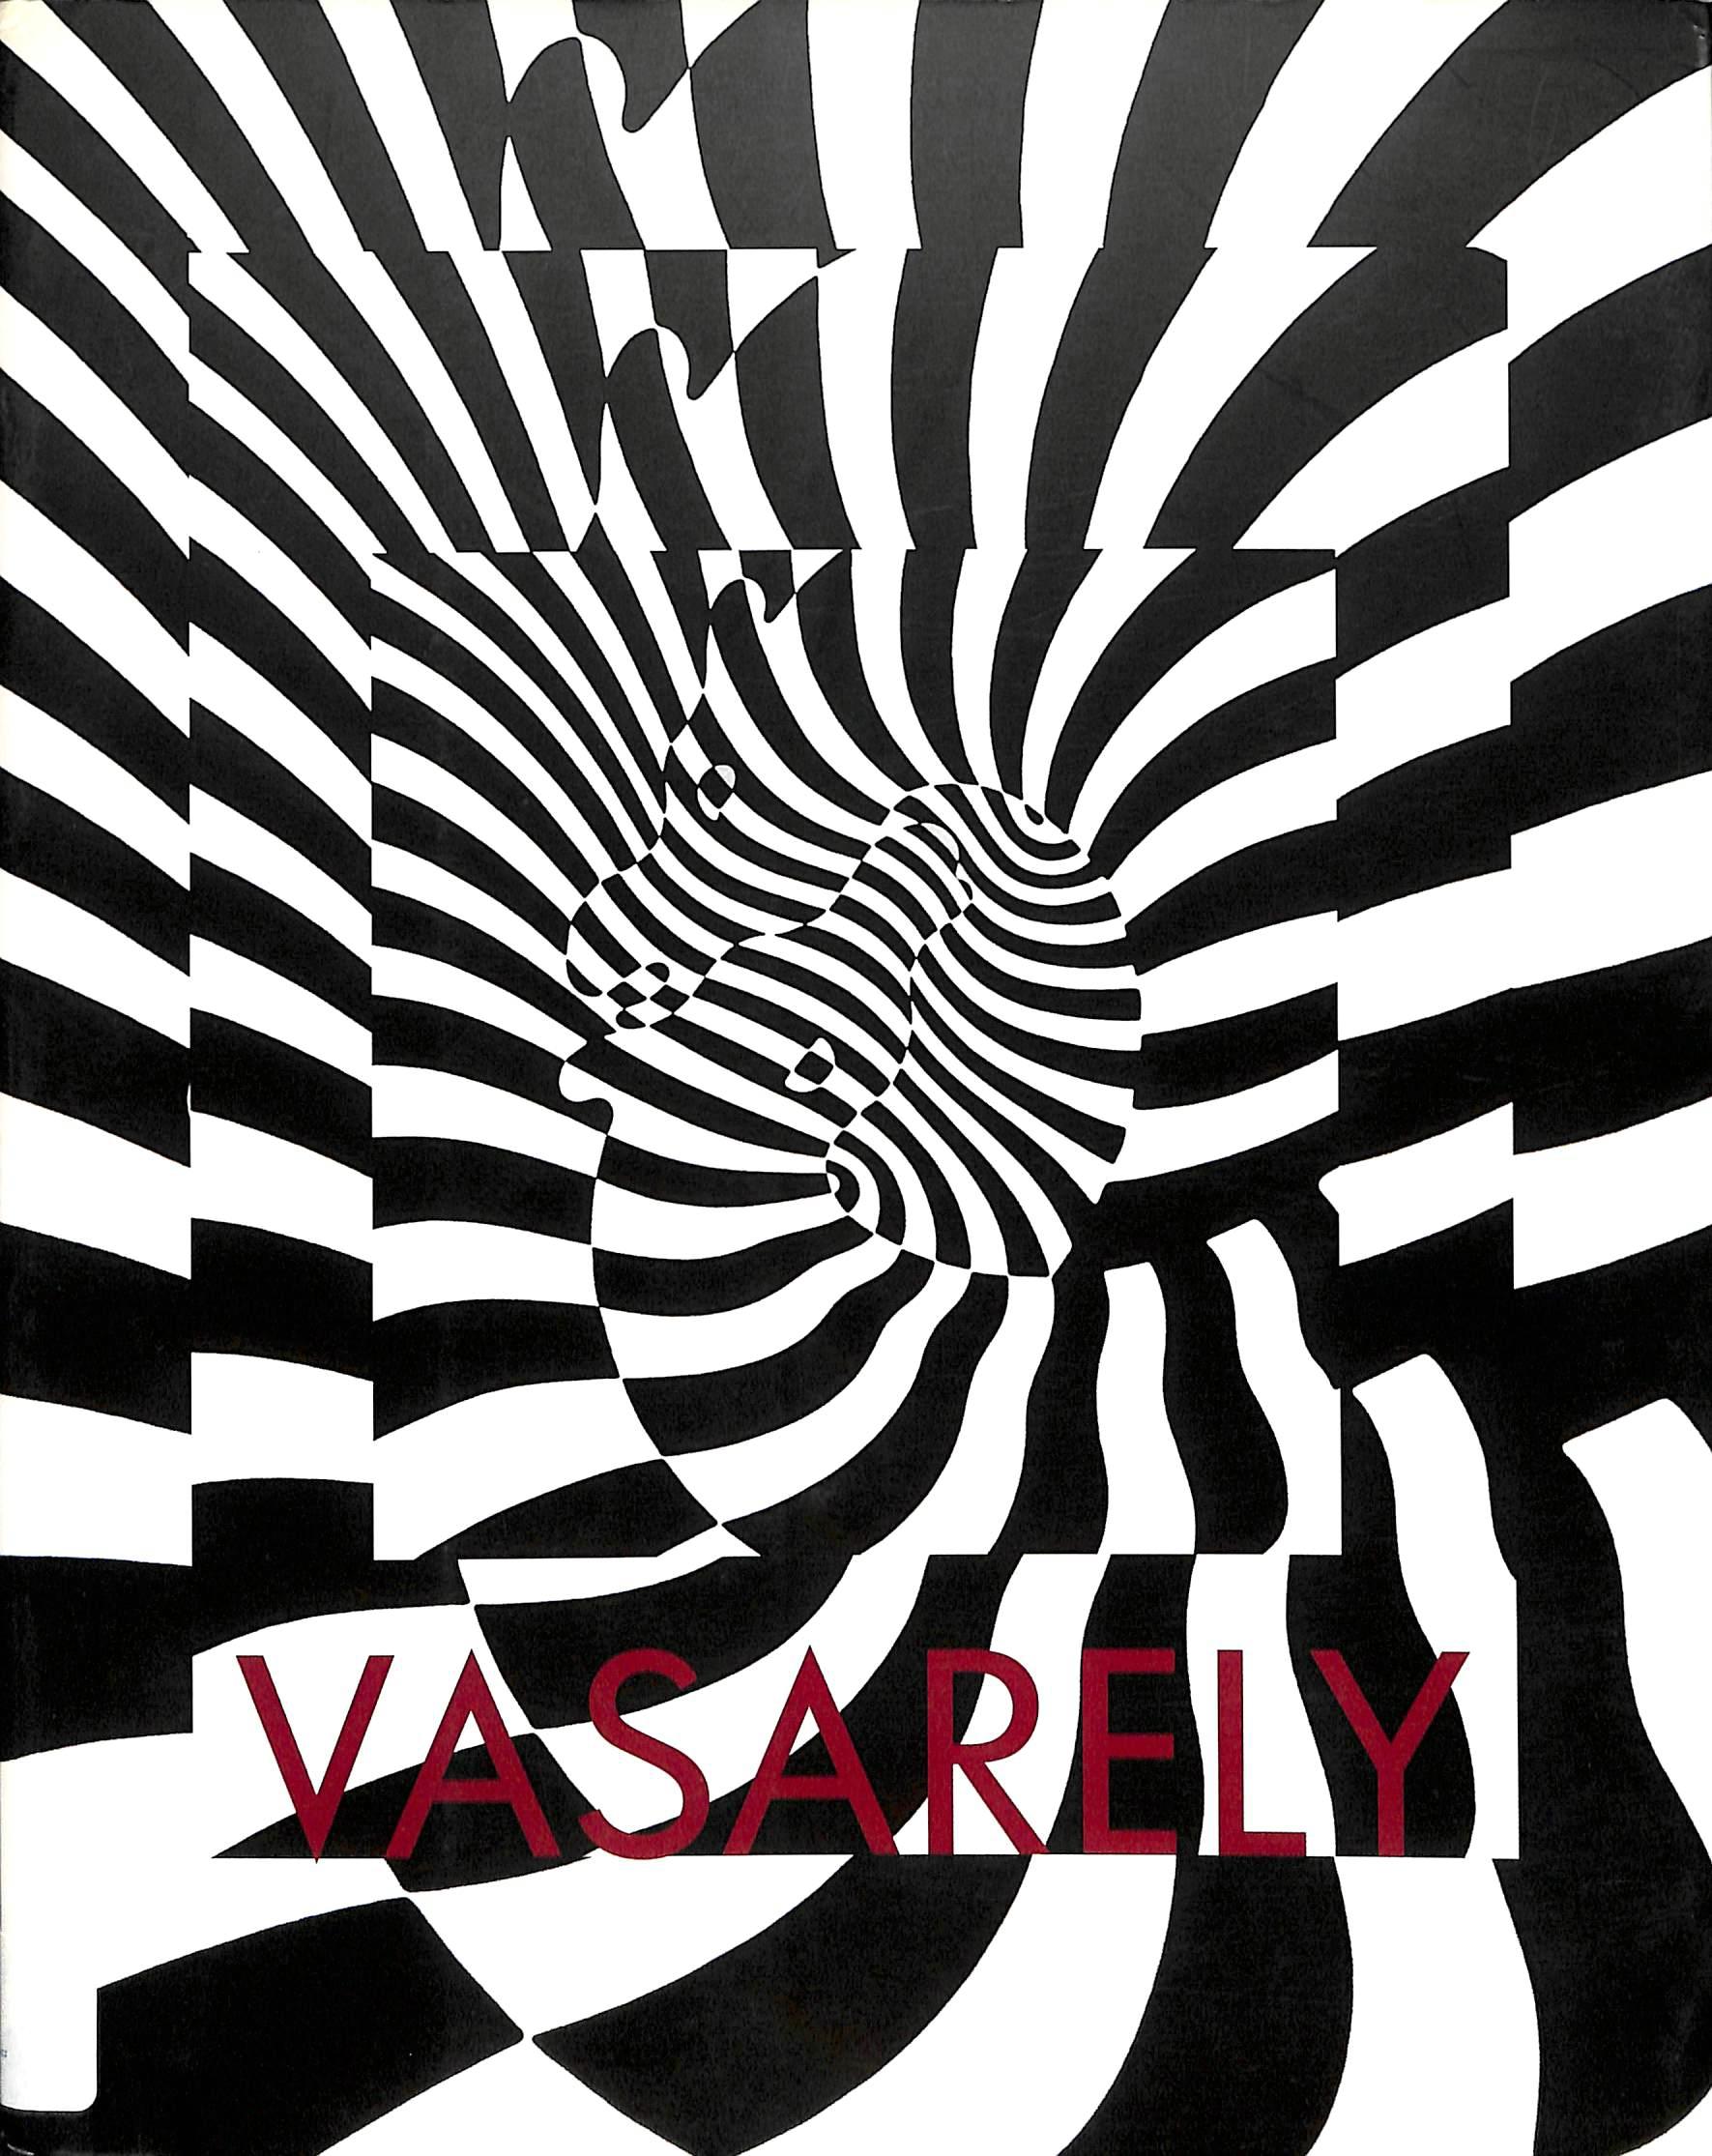 Victor Vasarely: 1ος τόμος: Το απόλυτο μάτι = 1er volume: l' oeil asolu = 1st volume: The absolute eye, Αθήνα: Artistic Investments, 2005